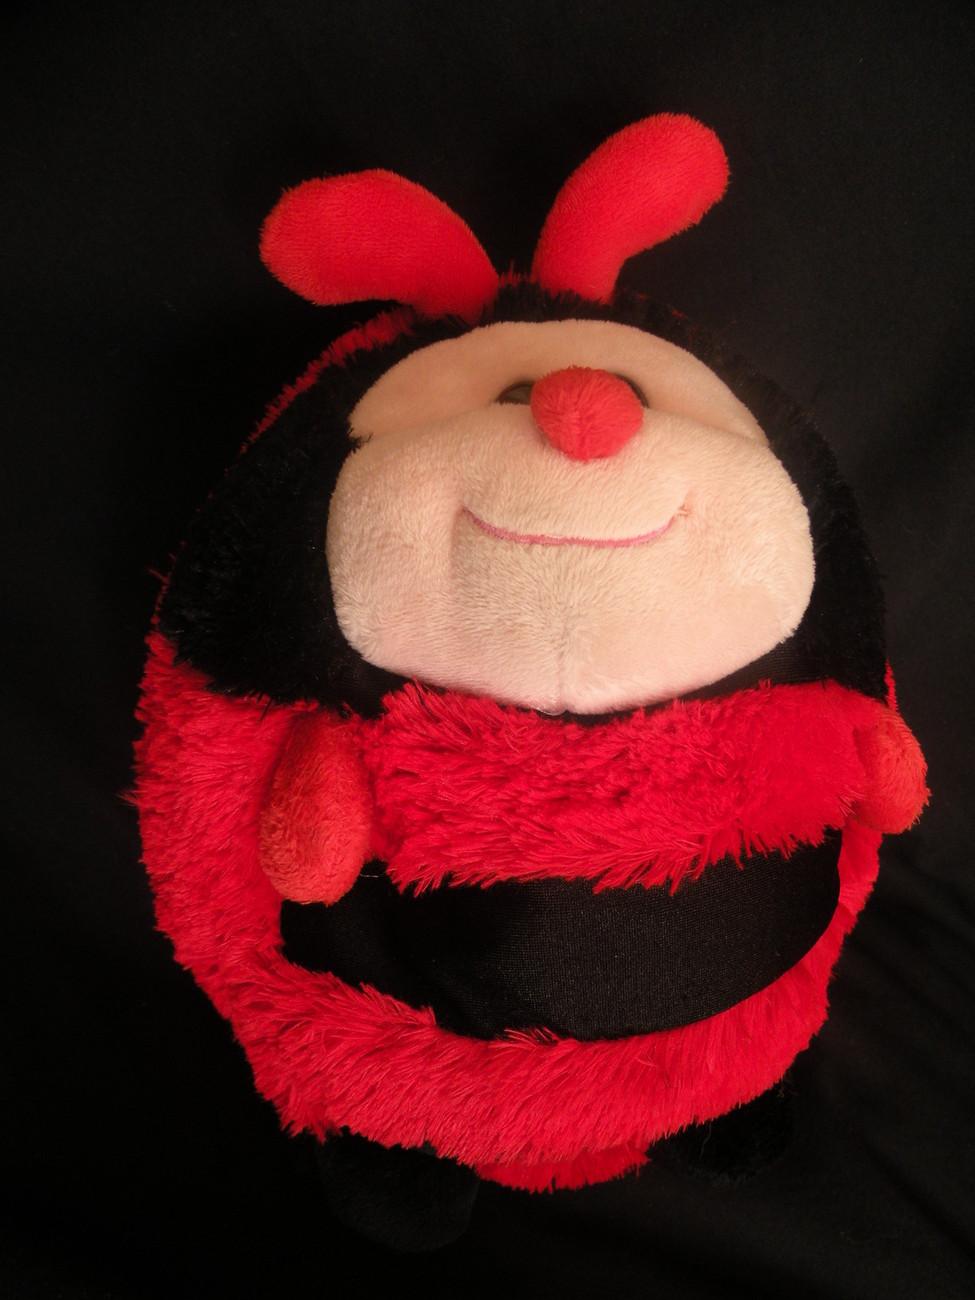 Cute Microbead Pillow : Ladybug Microbead Round Plush Mini Pillow Ball Stuffed Toy 8